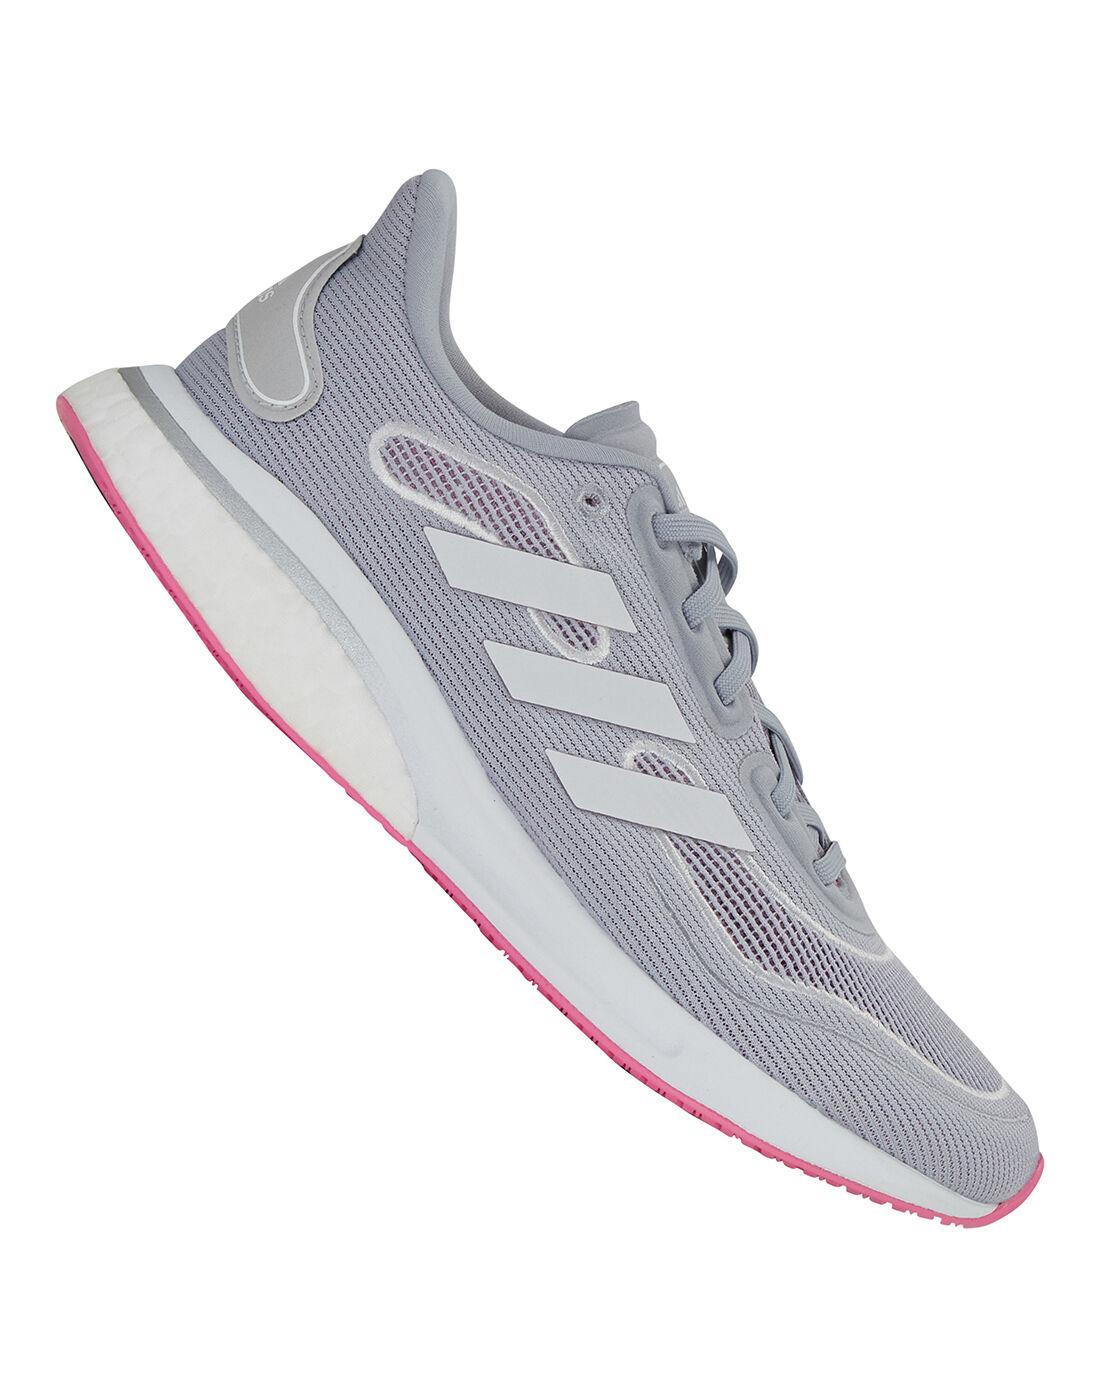 adidas adidas dance track pants for girls shoes | Womens Supernova